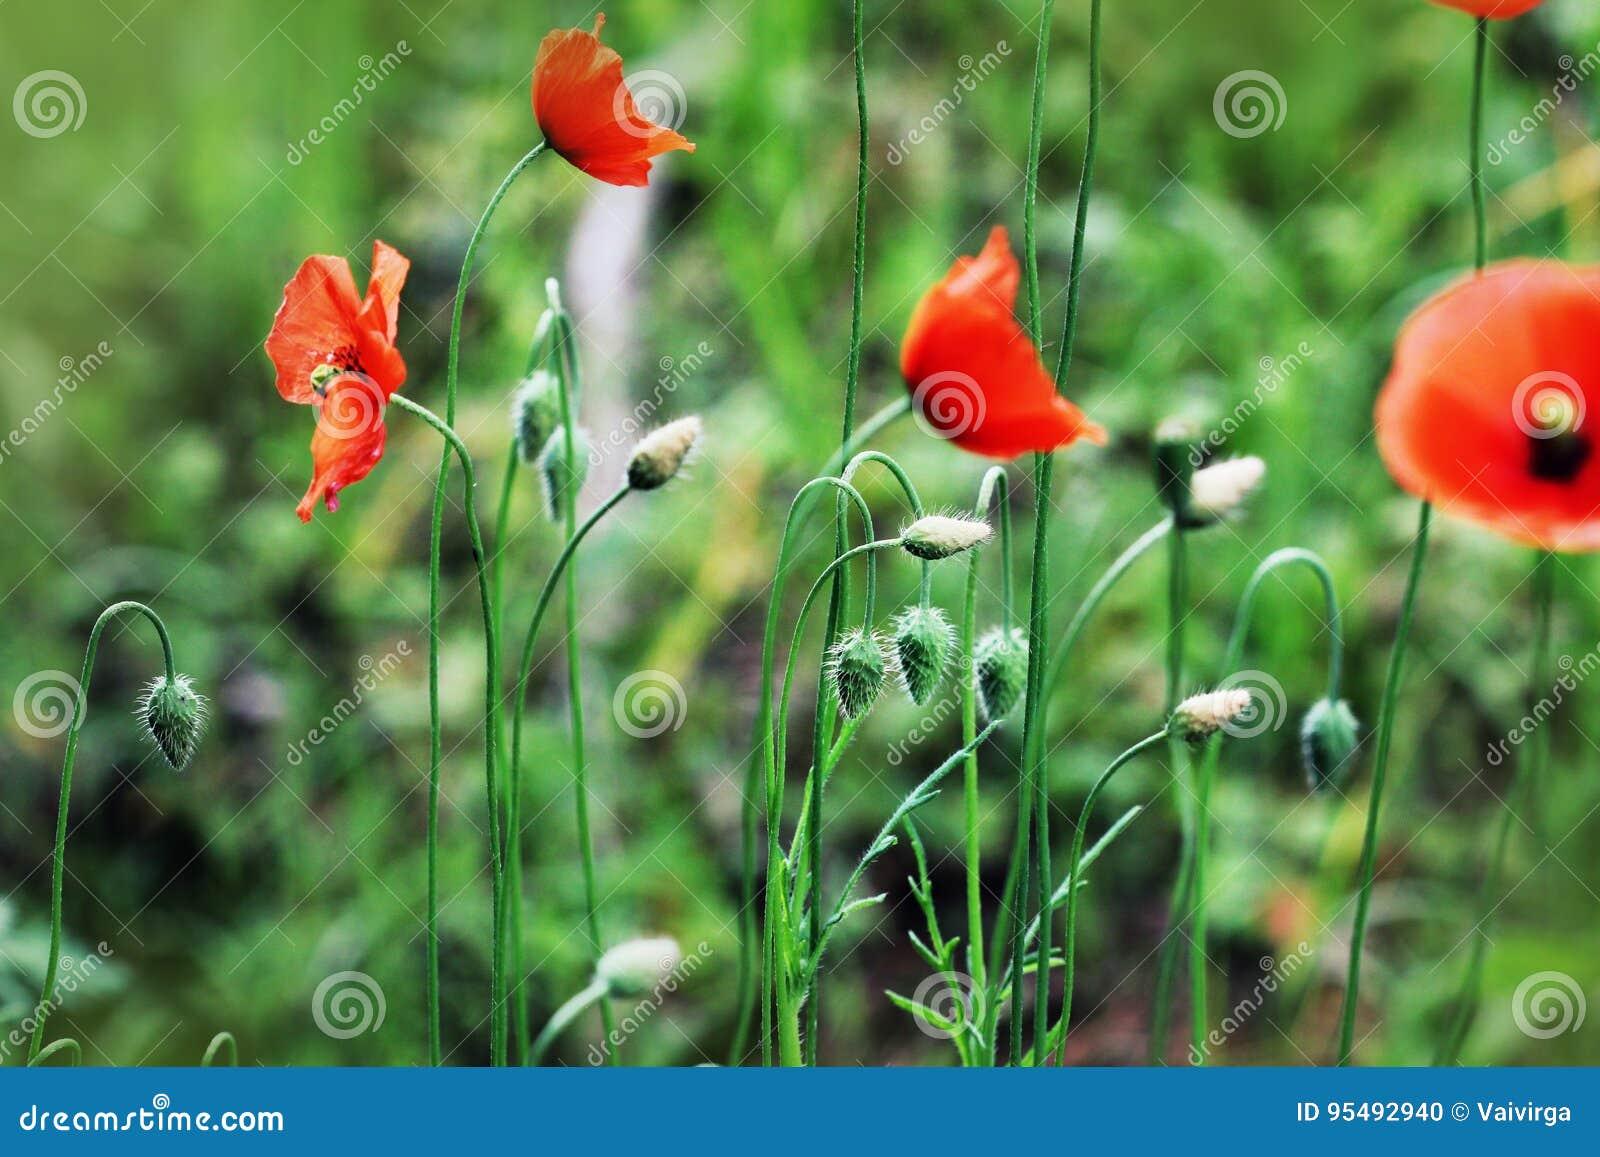 Beautiful Poppy Flowers On The Meadow In Summertime Red Meadow